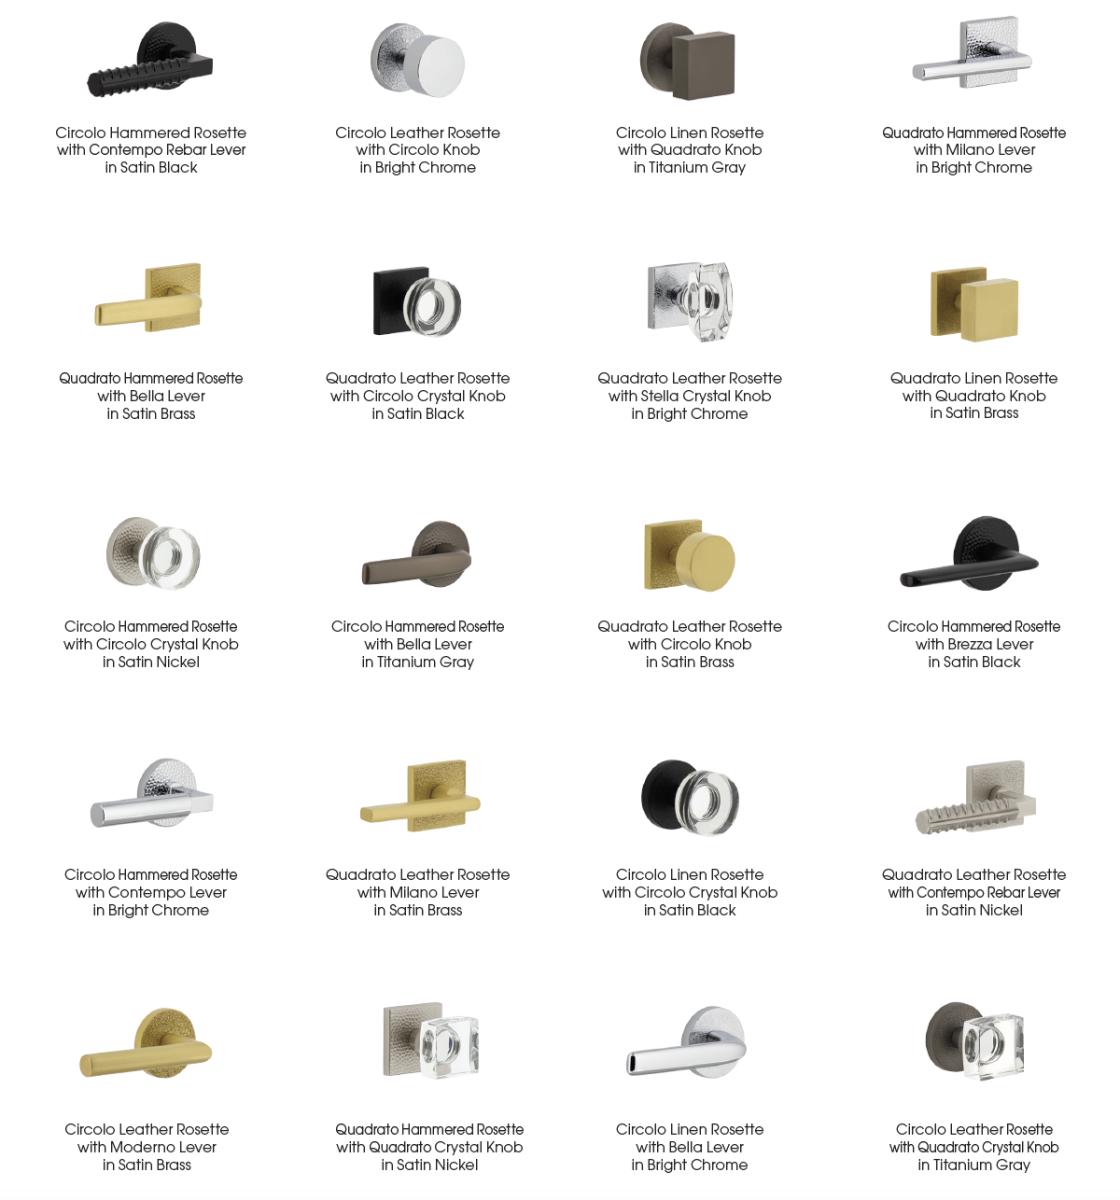 Motivo Collection by Viaggio Hardware